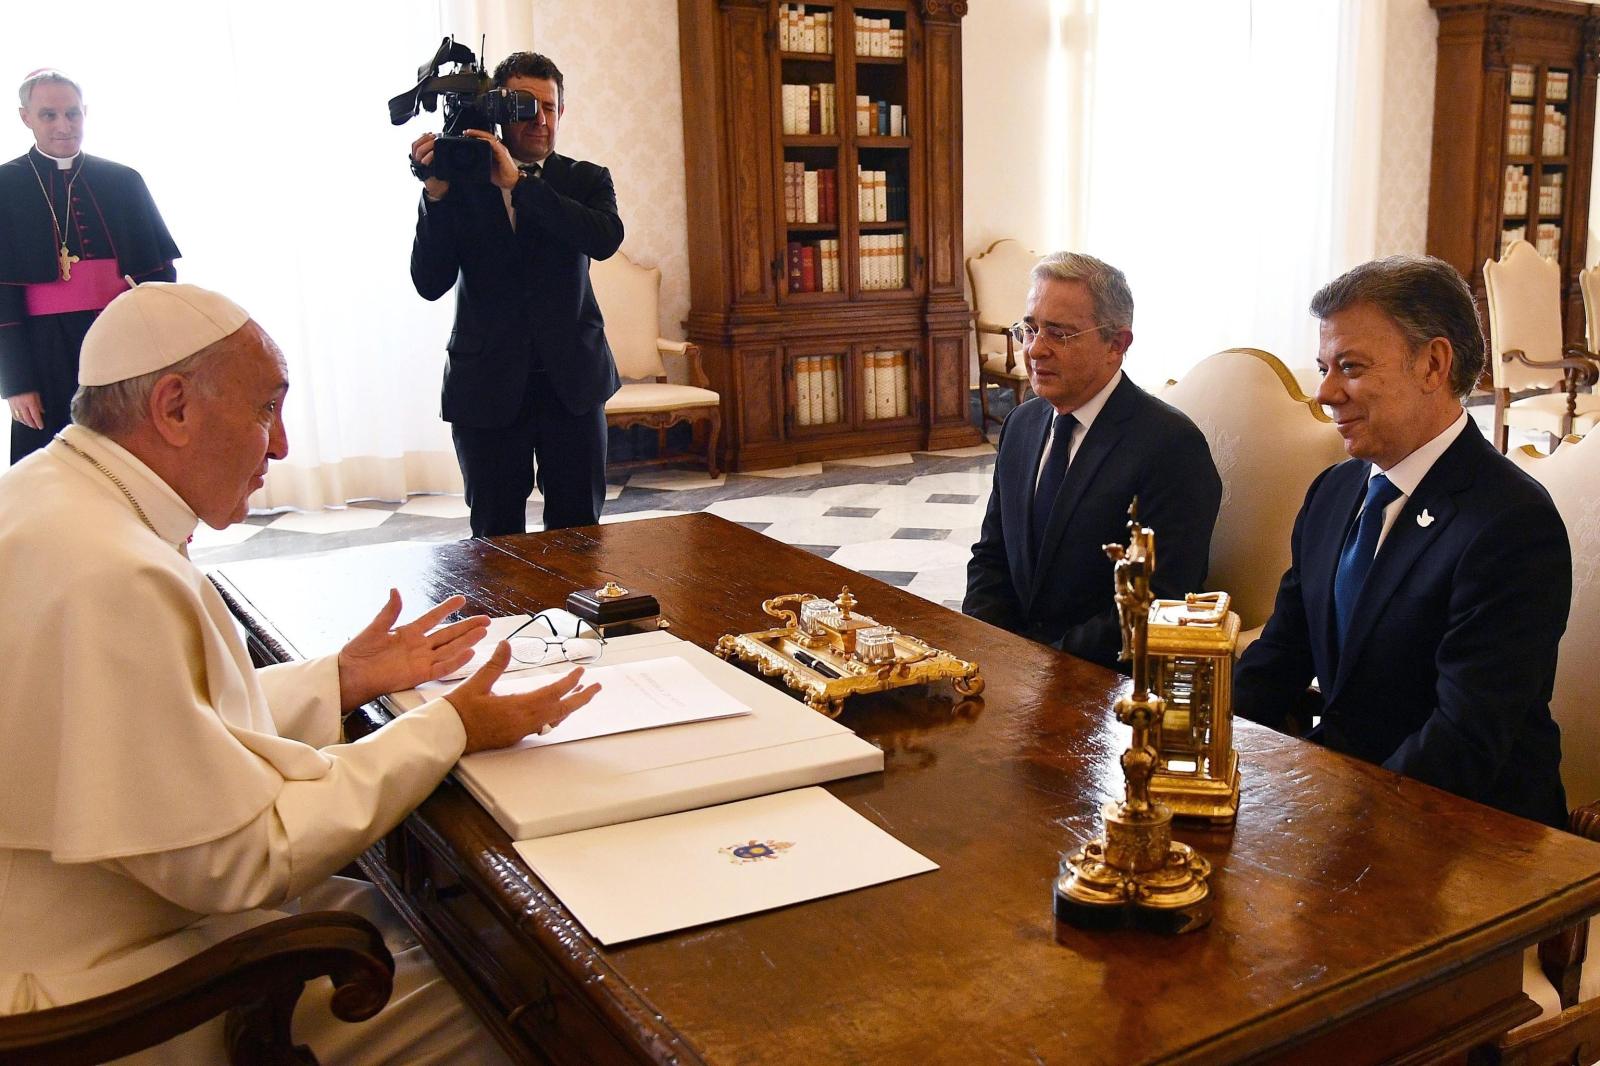 Spotkanie papieża Franciszka z prezydentem Kolumbii Juanem Manuelem Santosem i byłm prezydentem Alvaro Uribe. Fot. PAP/EPA/VINCENZO PINTO